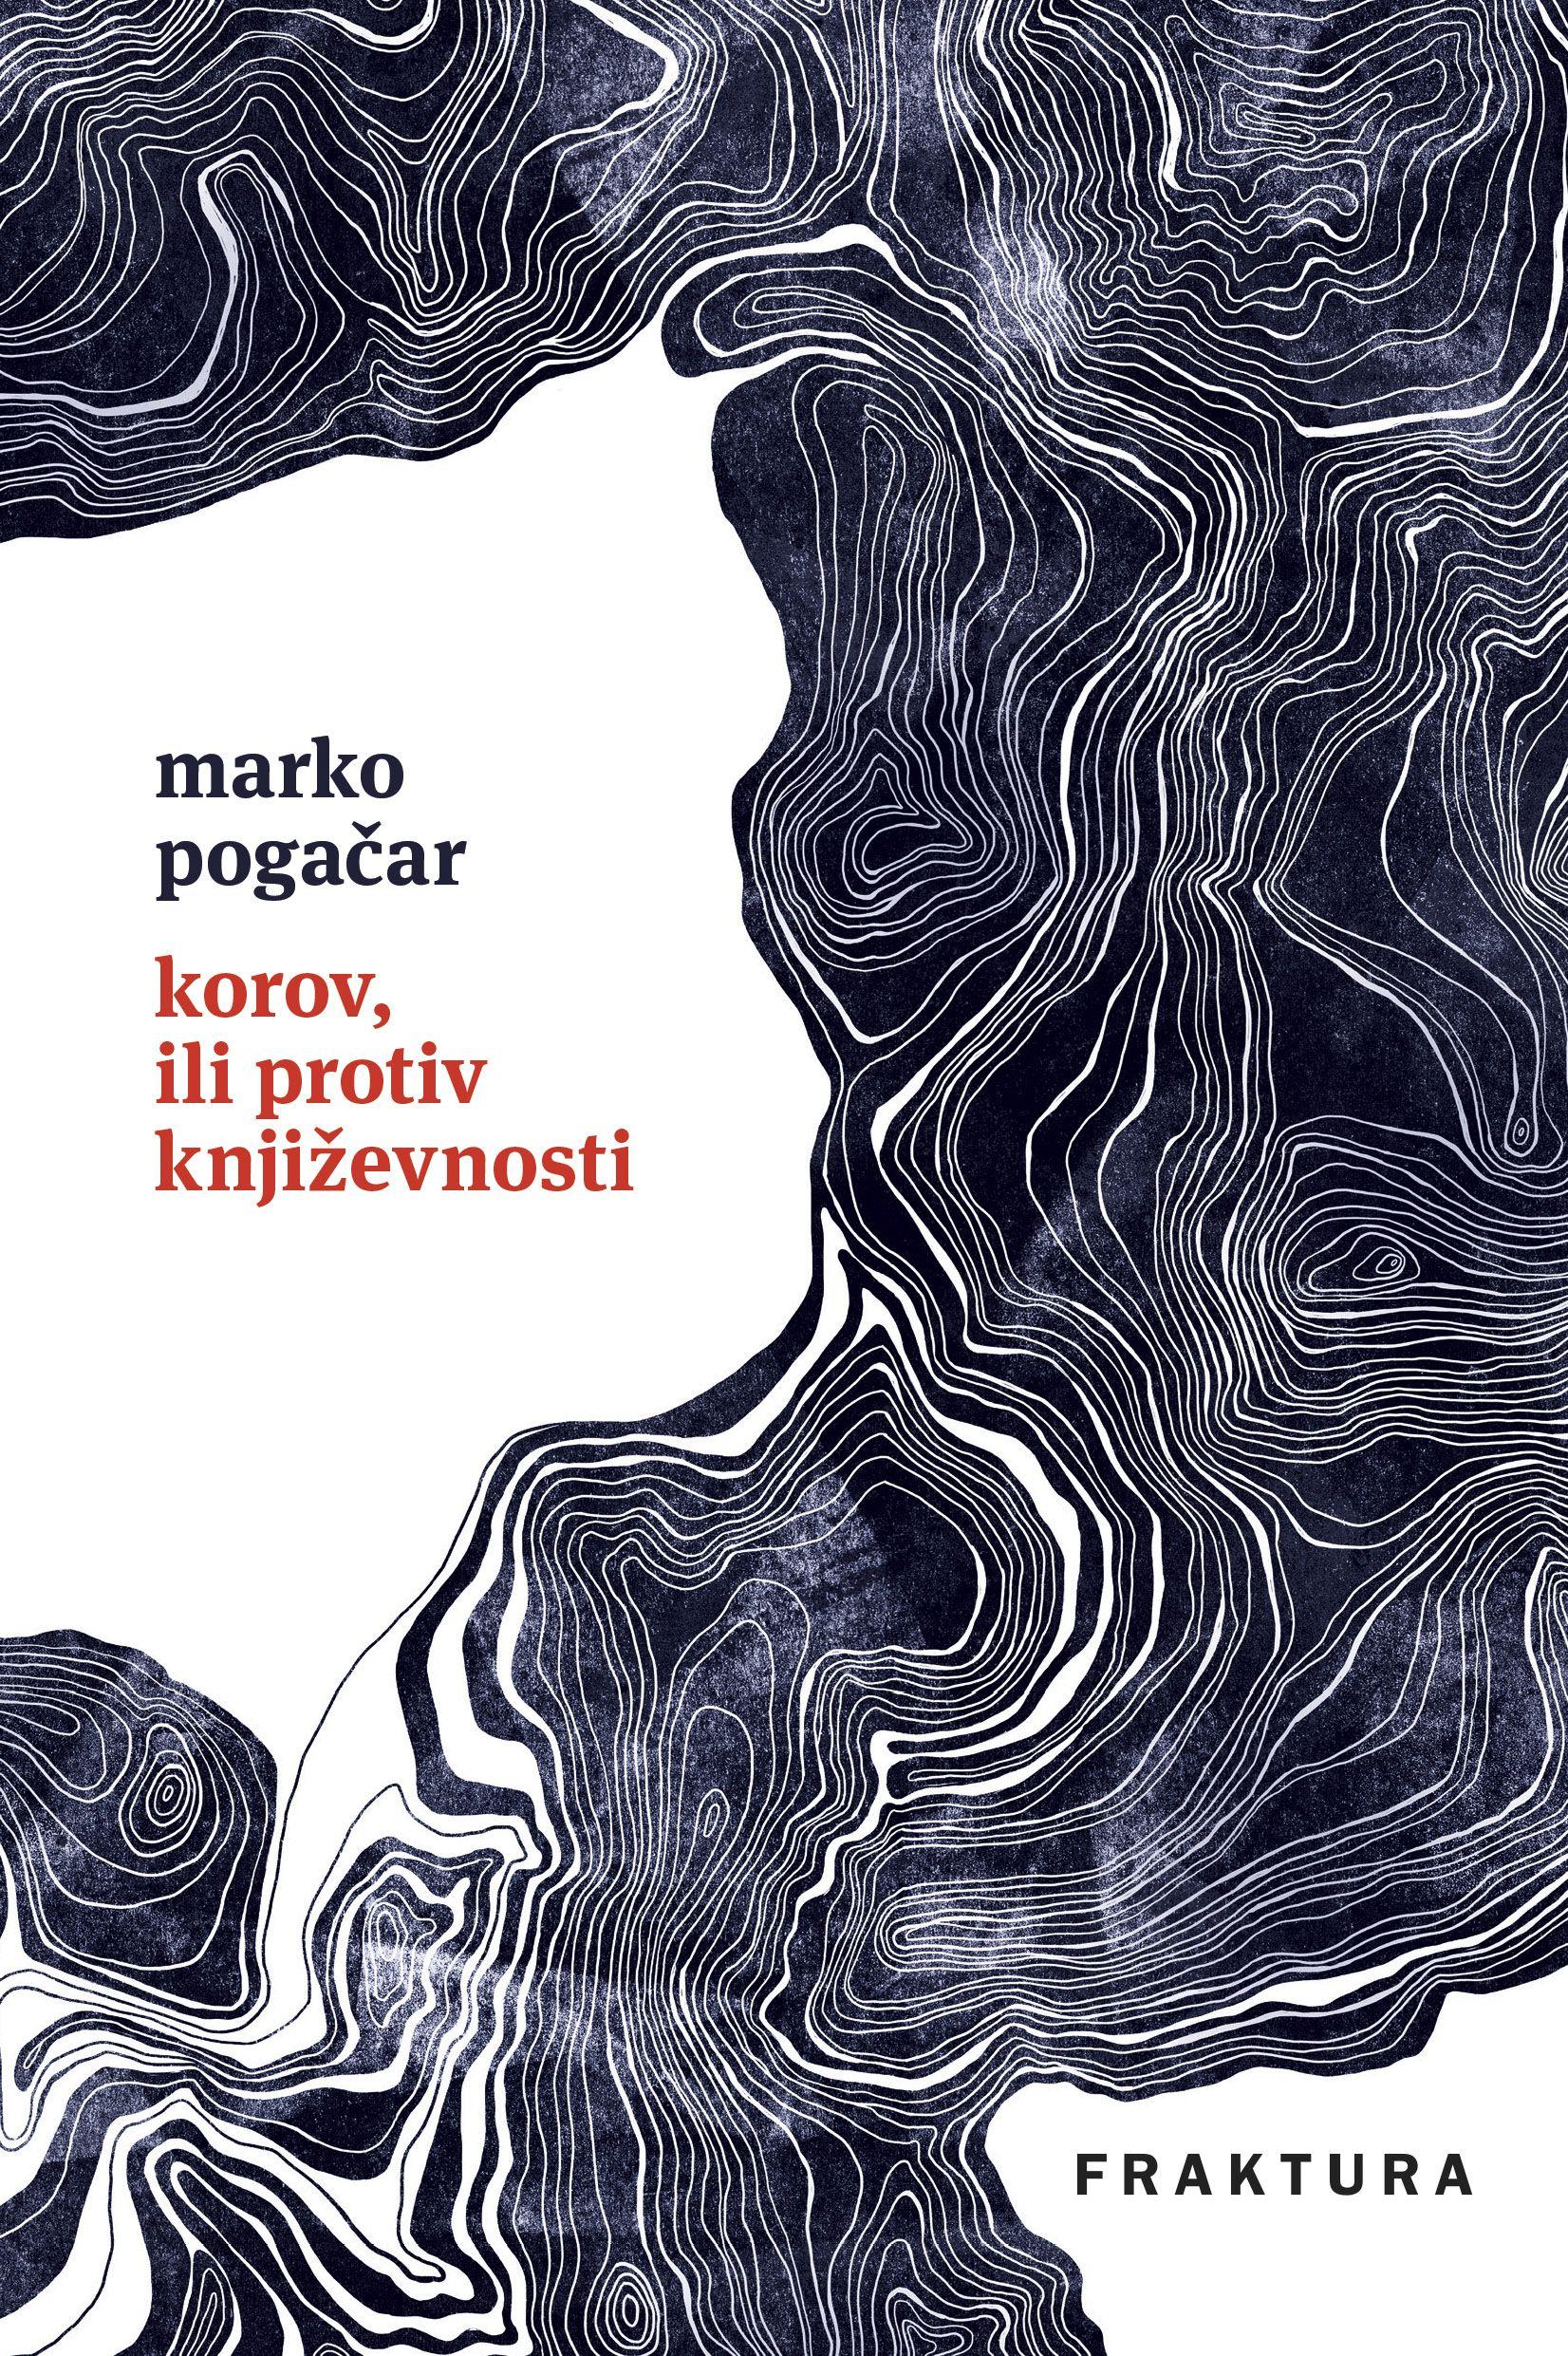 Večeras – Predstavljanje knjige 'Korov, ili protiv književnosti' Marka Pogačara, te ostala predstavljanja